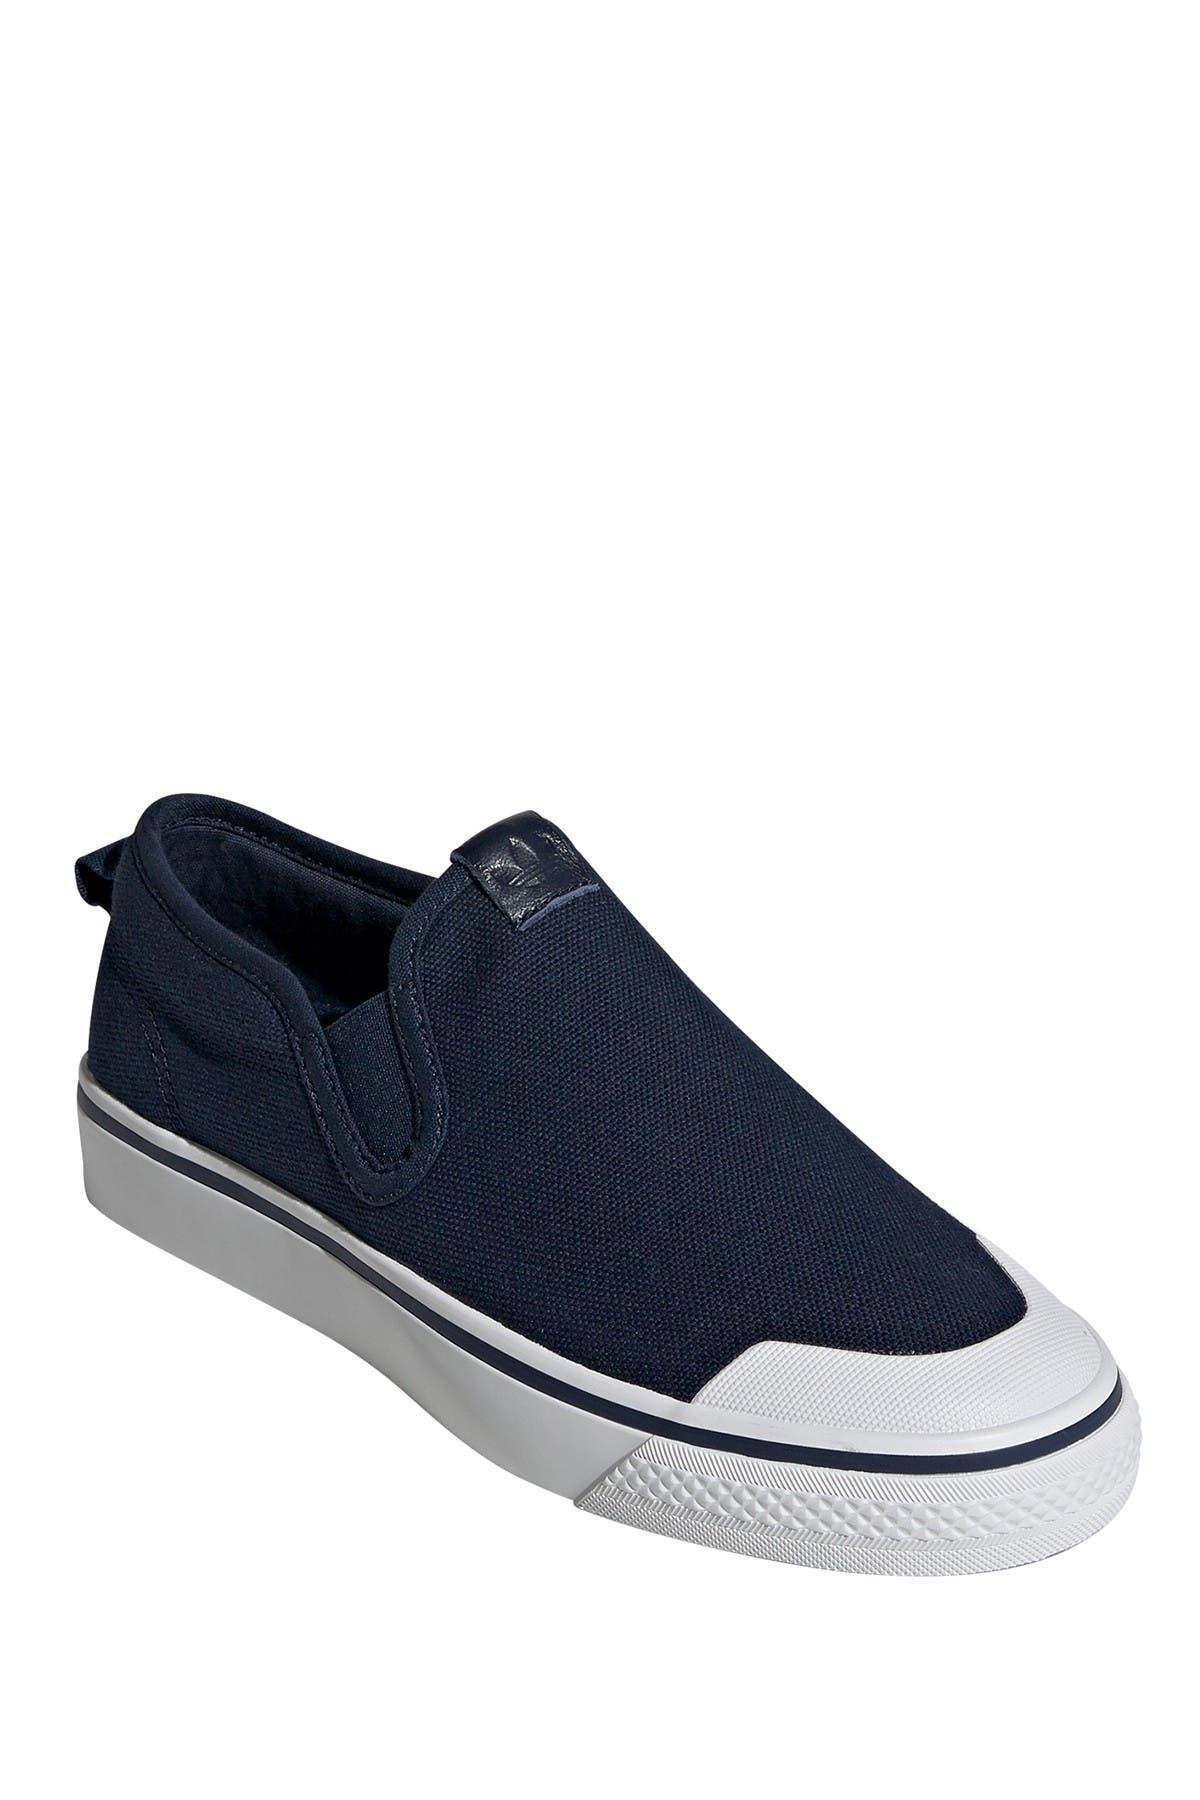 Image of adidas Nizza Slip-On Sneaker